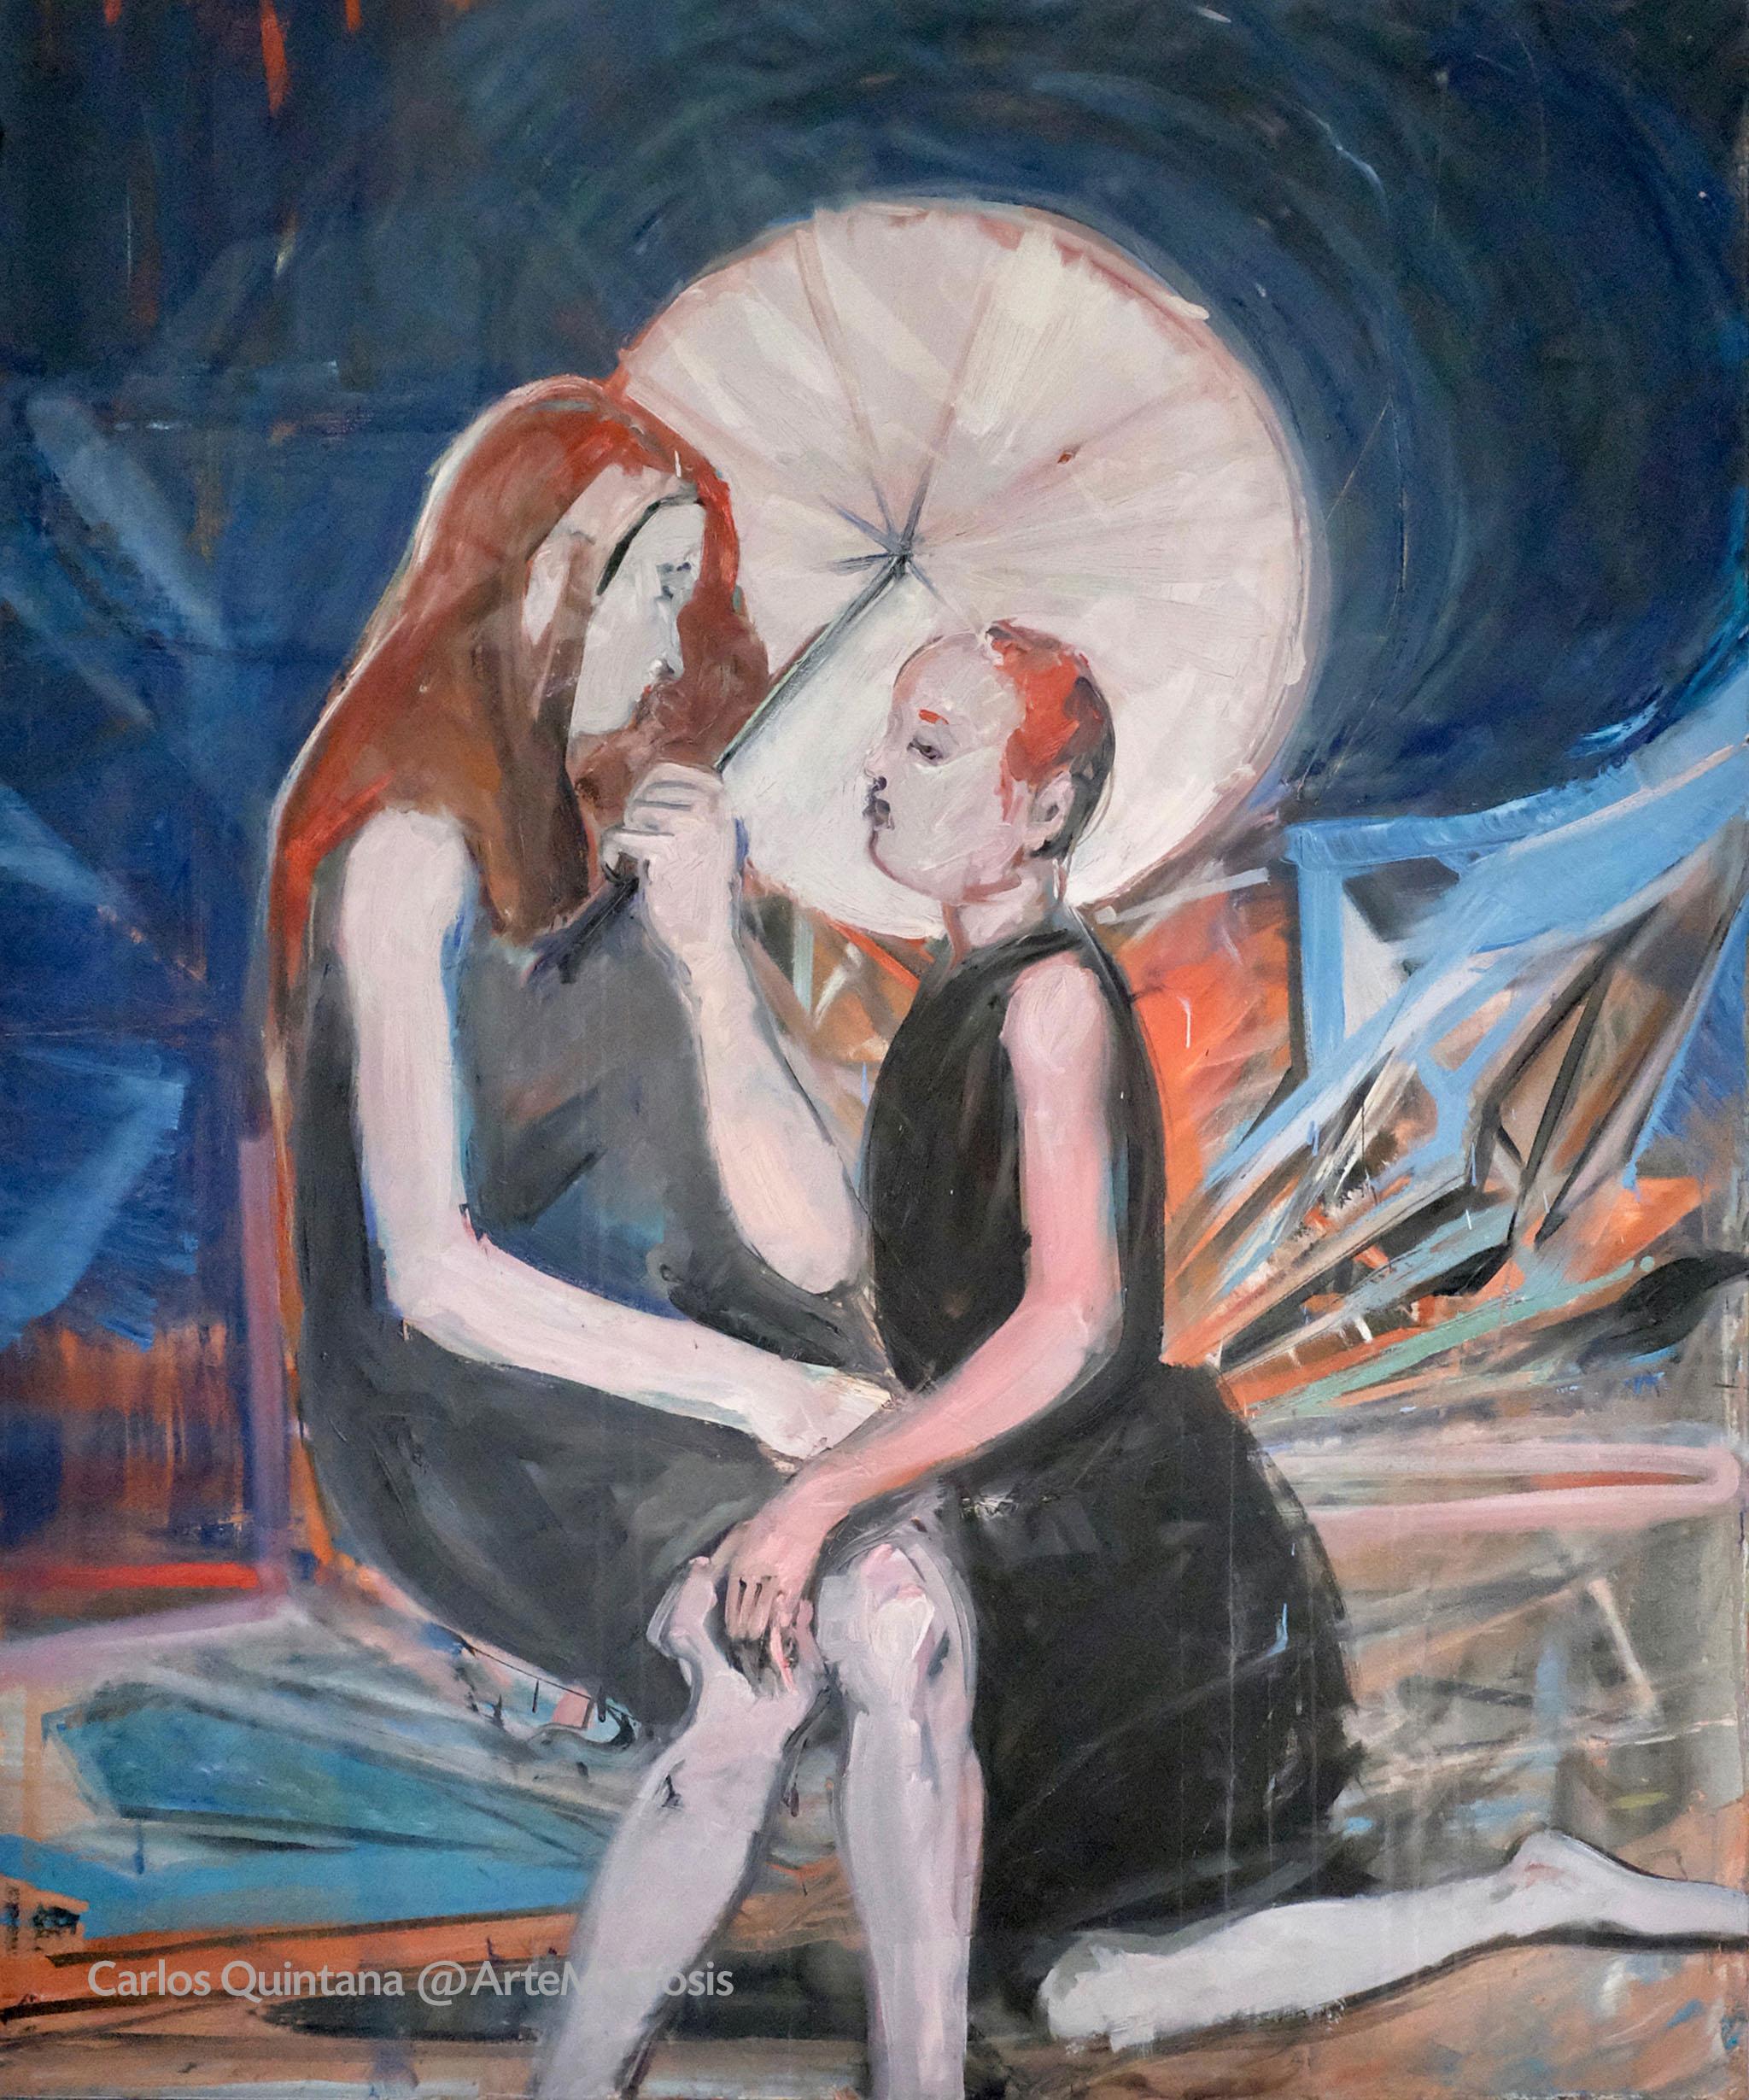 Ohne Titel | Sin título 2017, Öl, Tinte auf Leinwand | Óleo, tinta sobre tela 152 x 122 cm